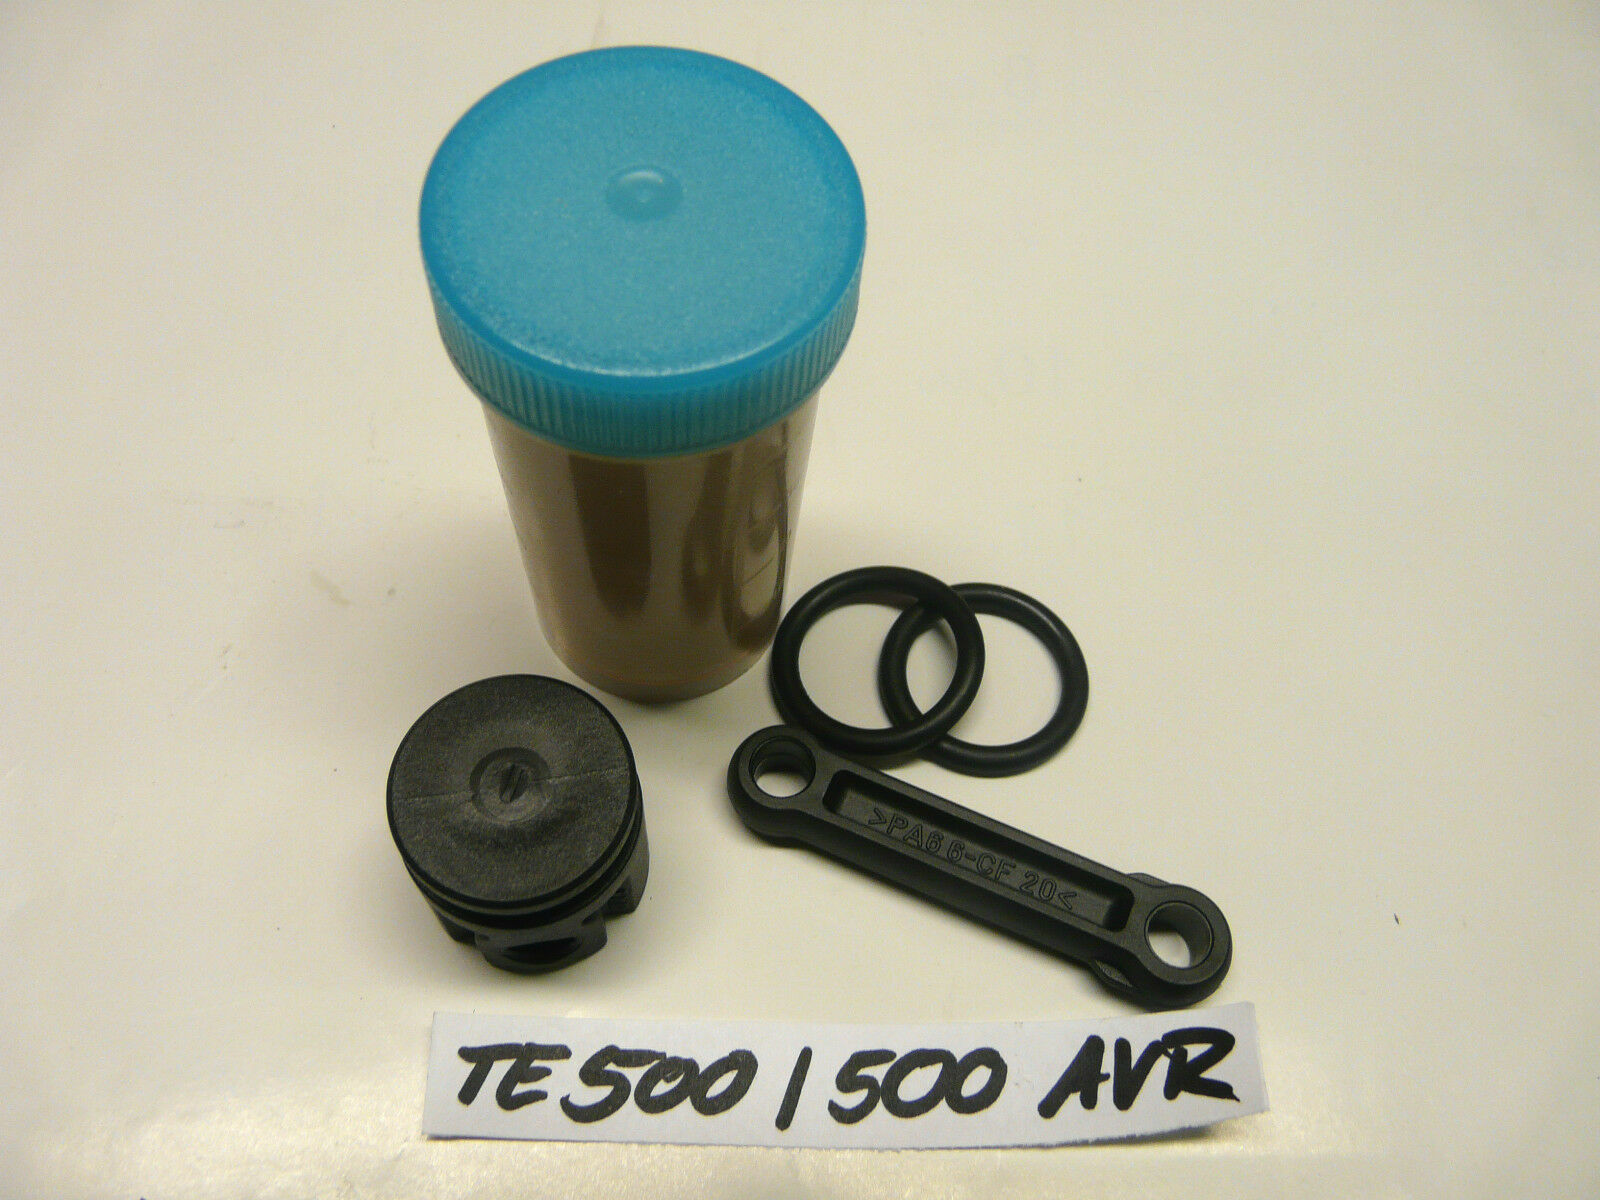 Hilti TE 500, TE 500 AVR Pleuel + Erregerkolben + O-Ring für Schlagwerk + Öl